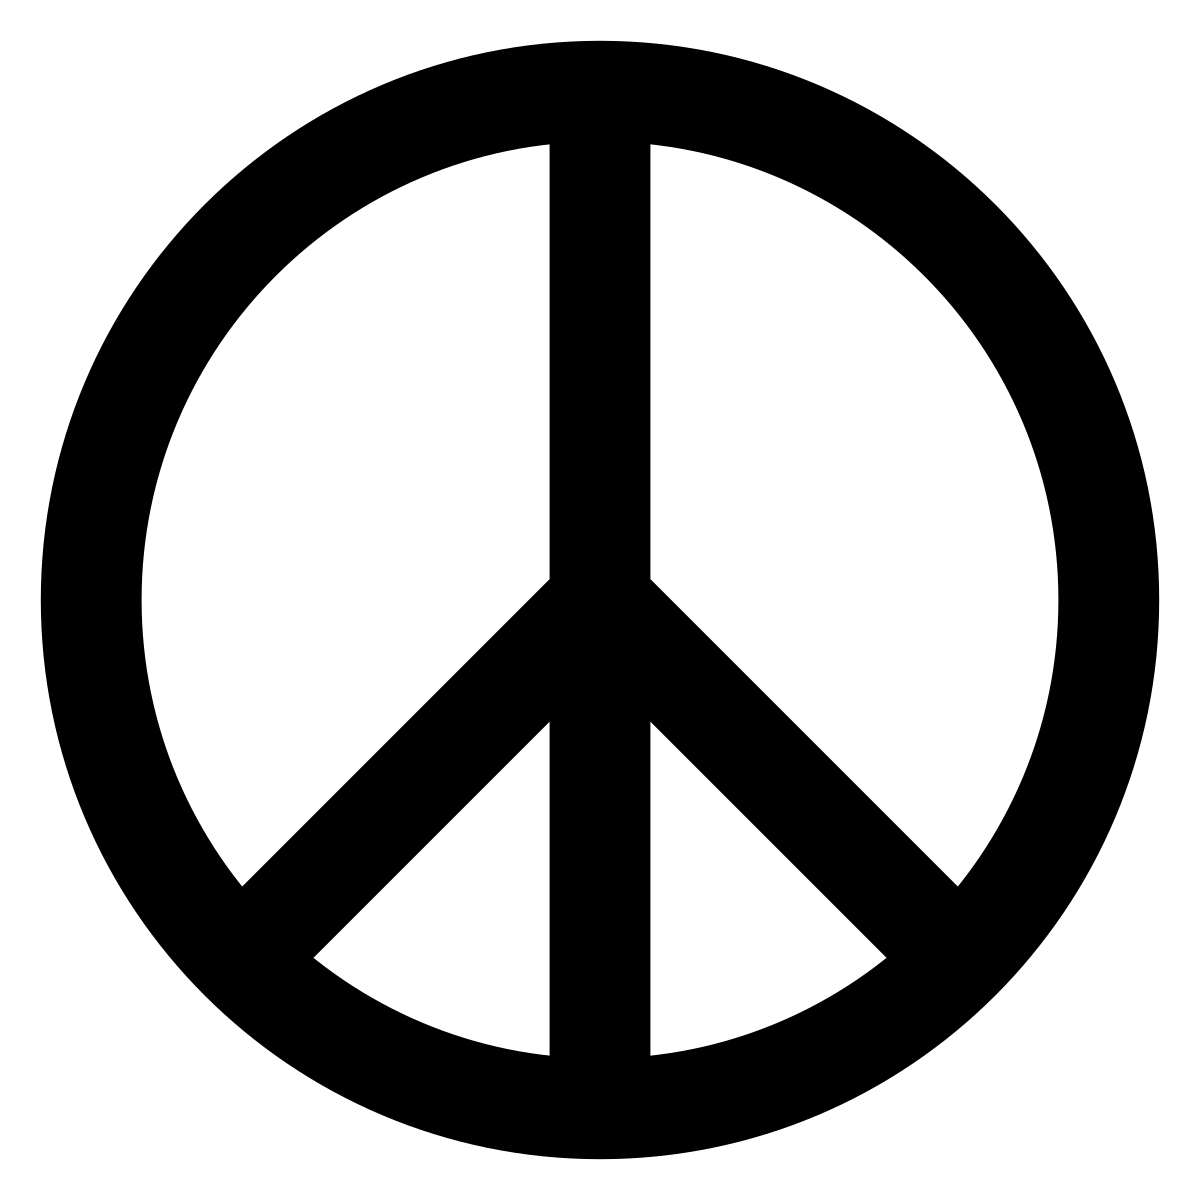 1200px-Peace_sign.svg